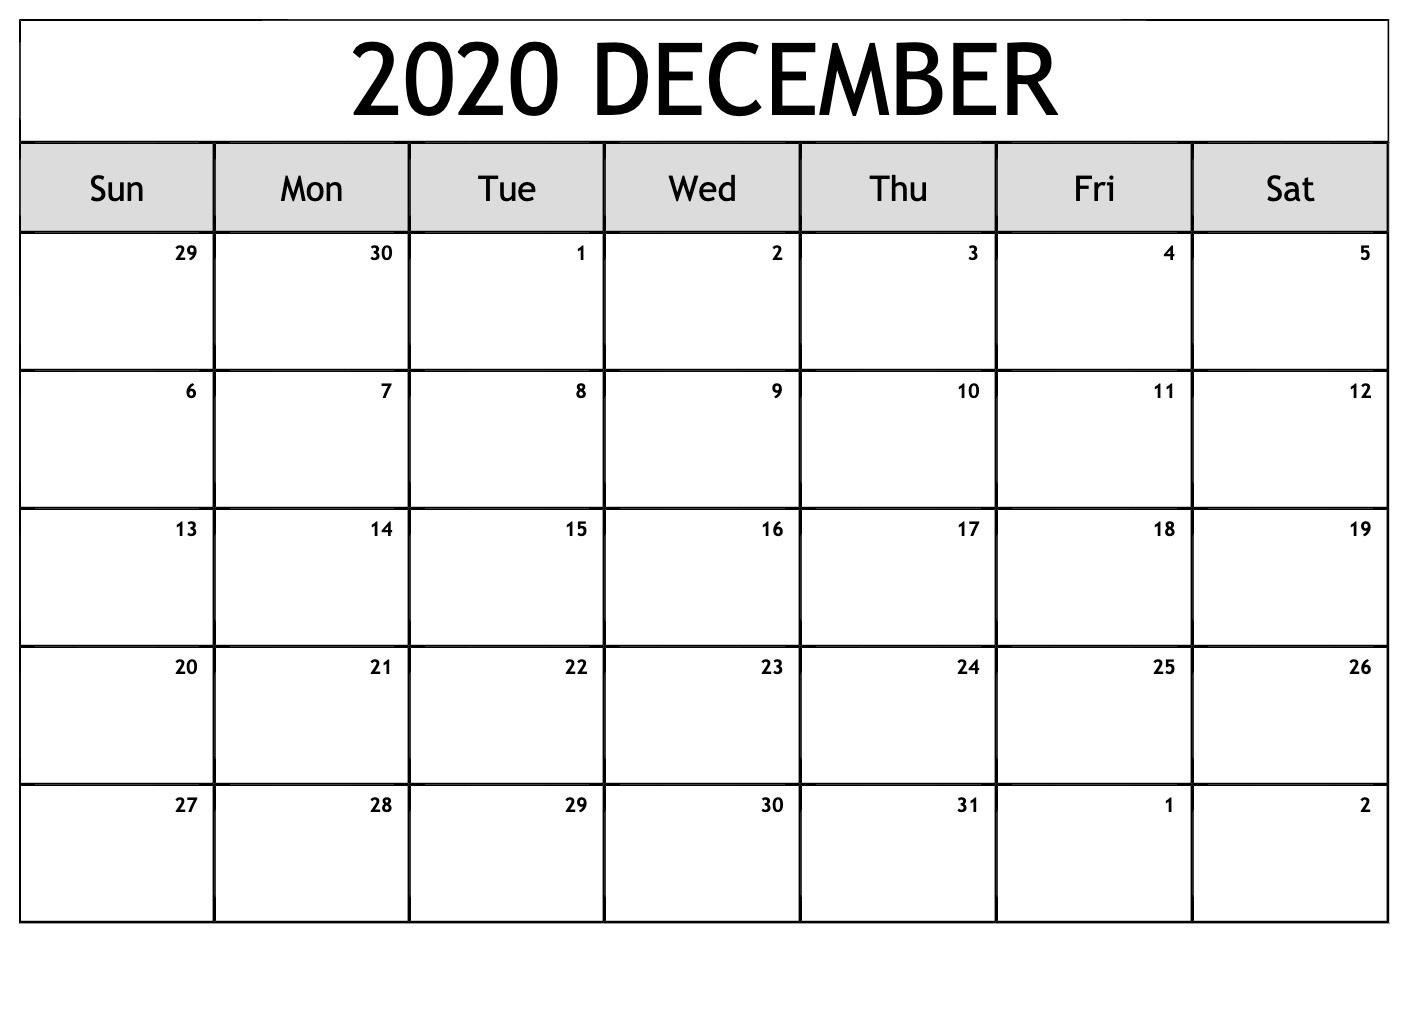 December 2020 Blank Template